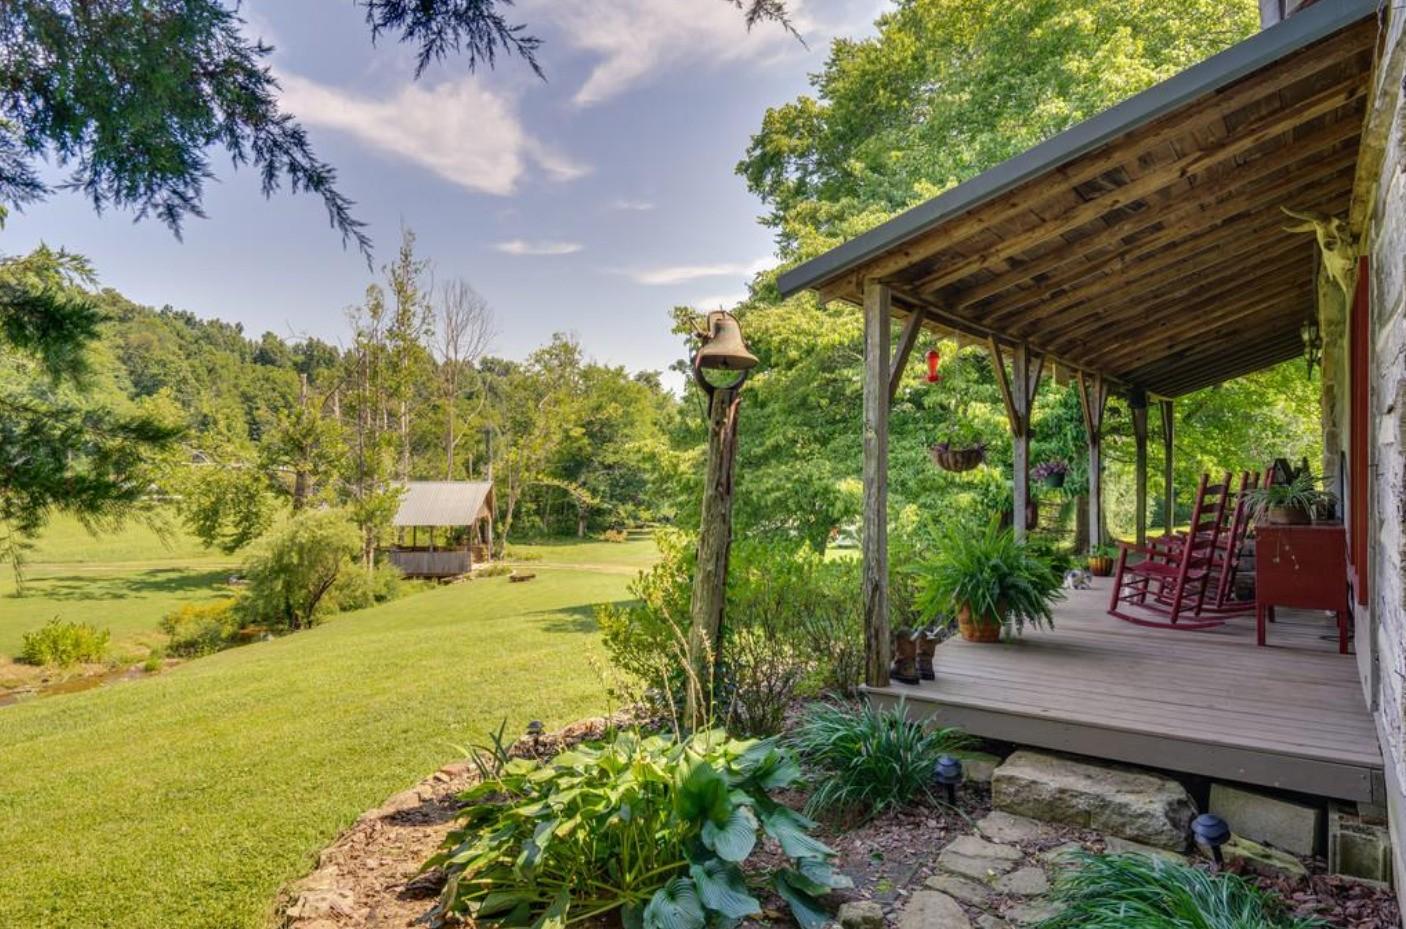 835 Powdermill Hill Rd Property Photo - Lawrenceburg, TN real estate listing